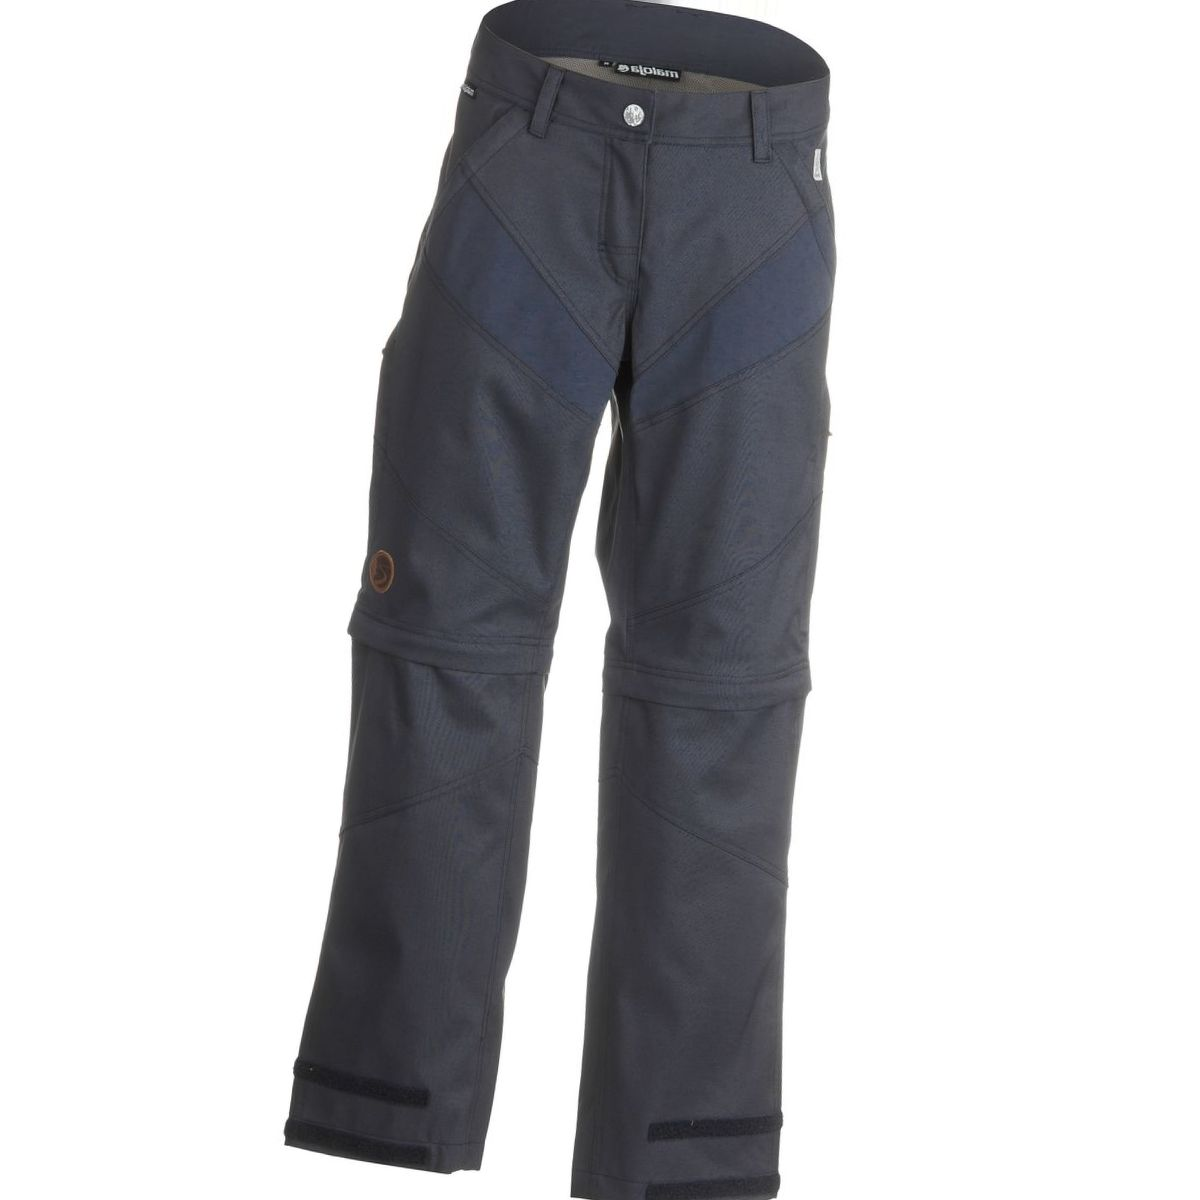 Maloja BigiunM Pants - Men's